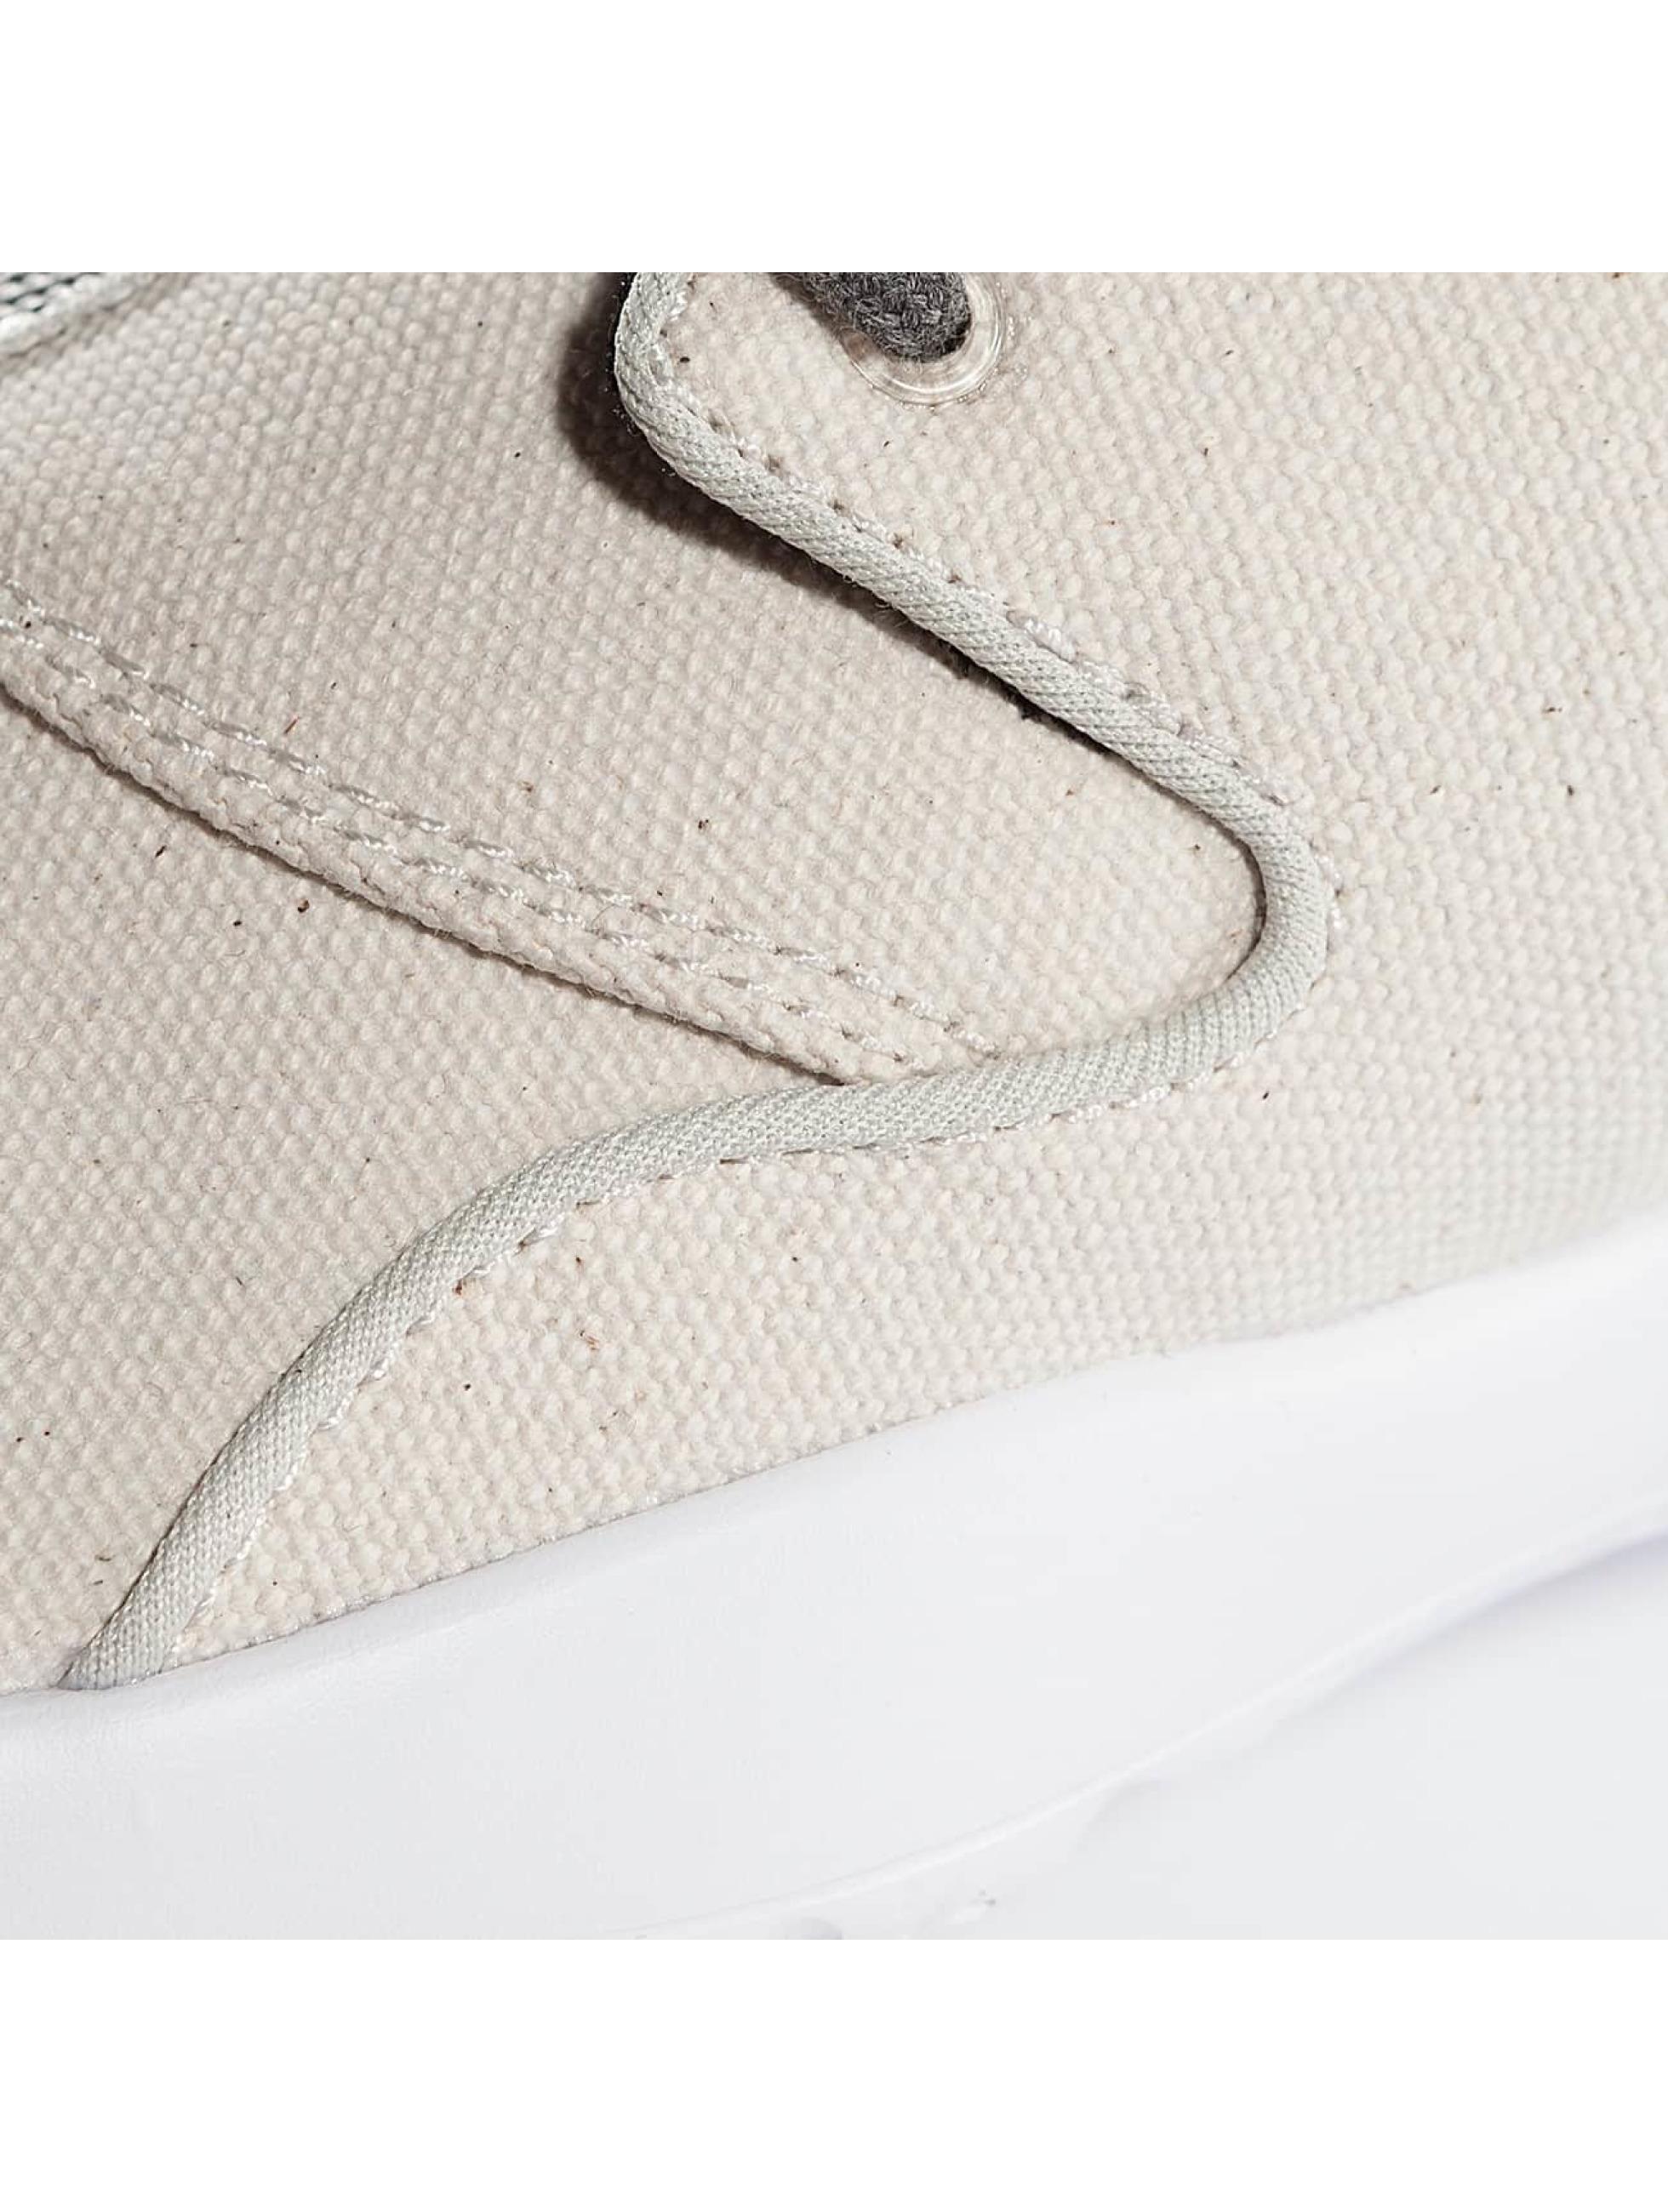 Jordan Sneakers Eclipse Chukka Sneakers kaki